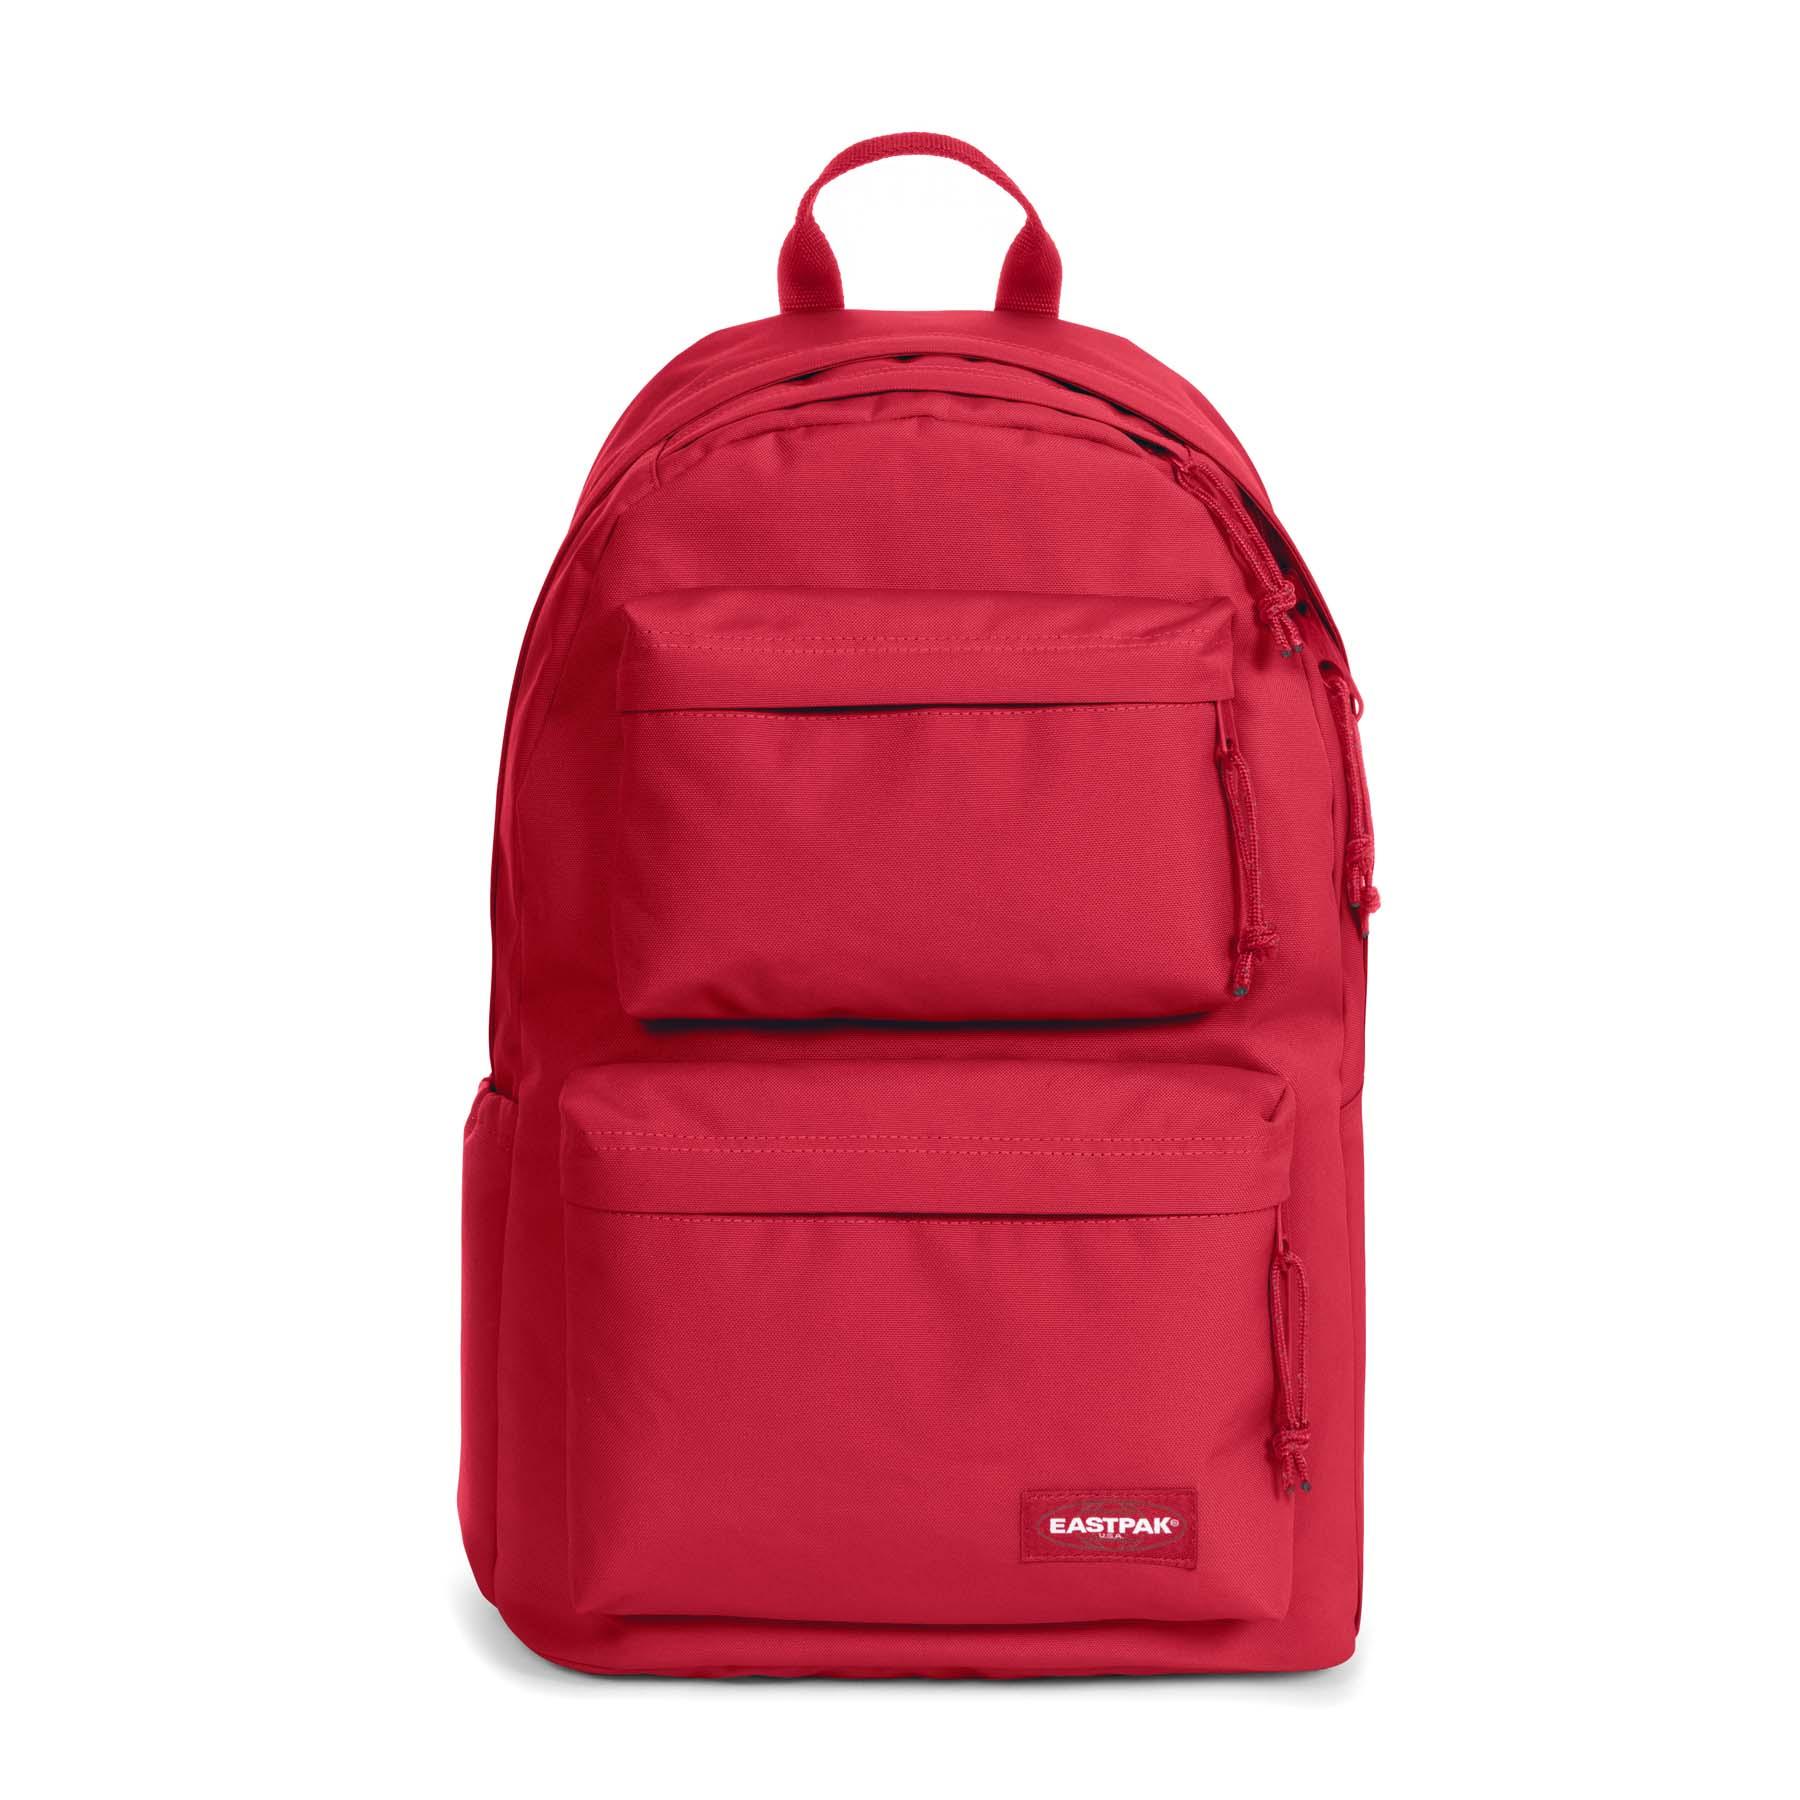 Eastpak S/S 2022 Lifestyle Backpacks